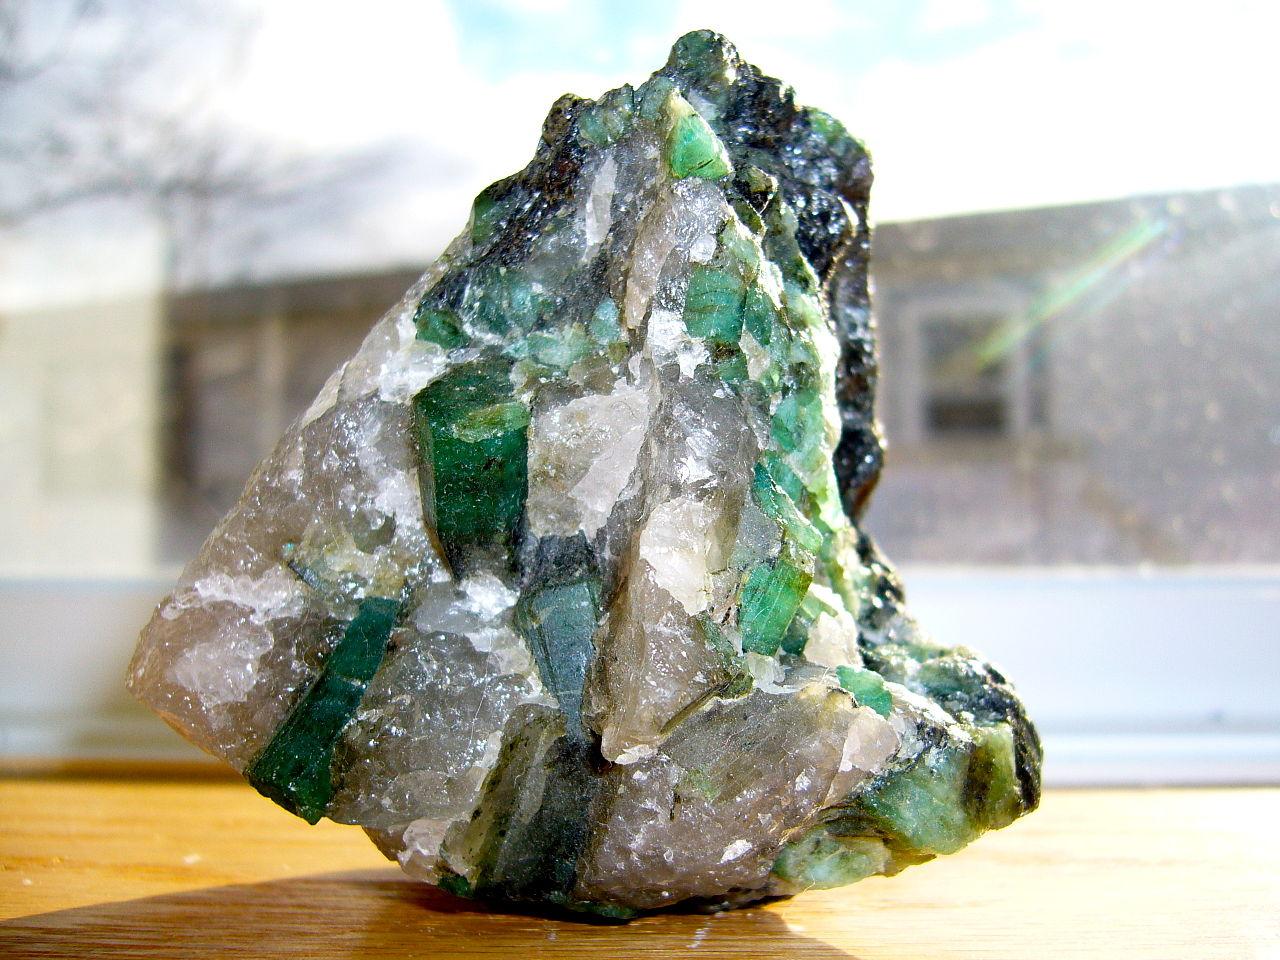 Emerald_in_a_quartz_and_pegmatite_matrix.JPG